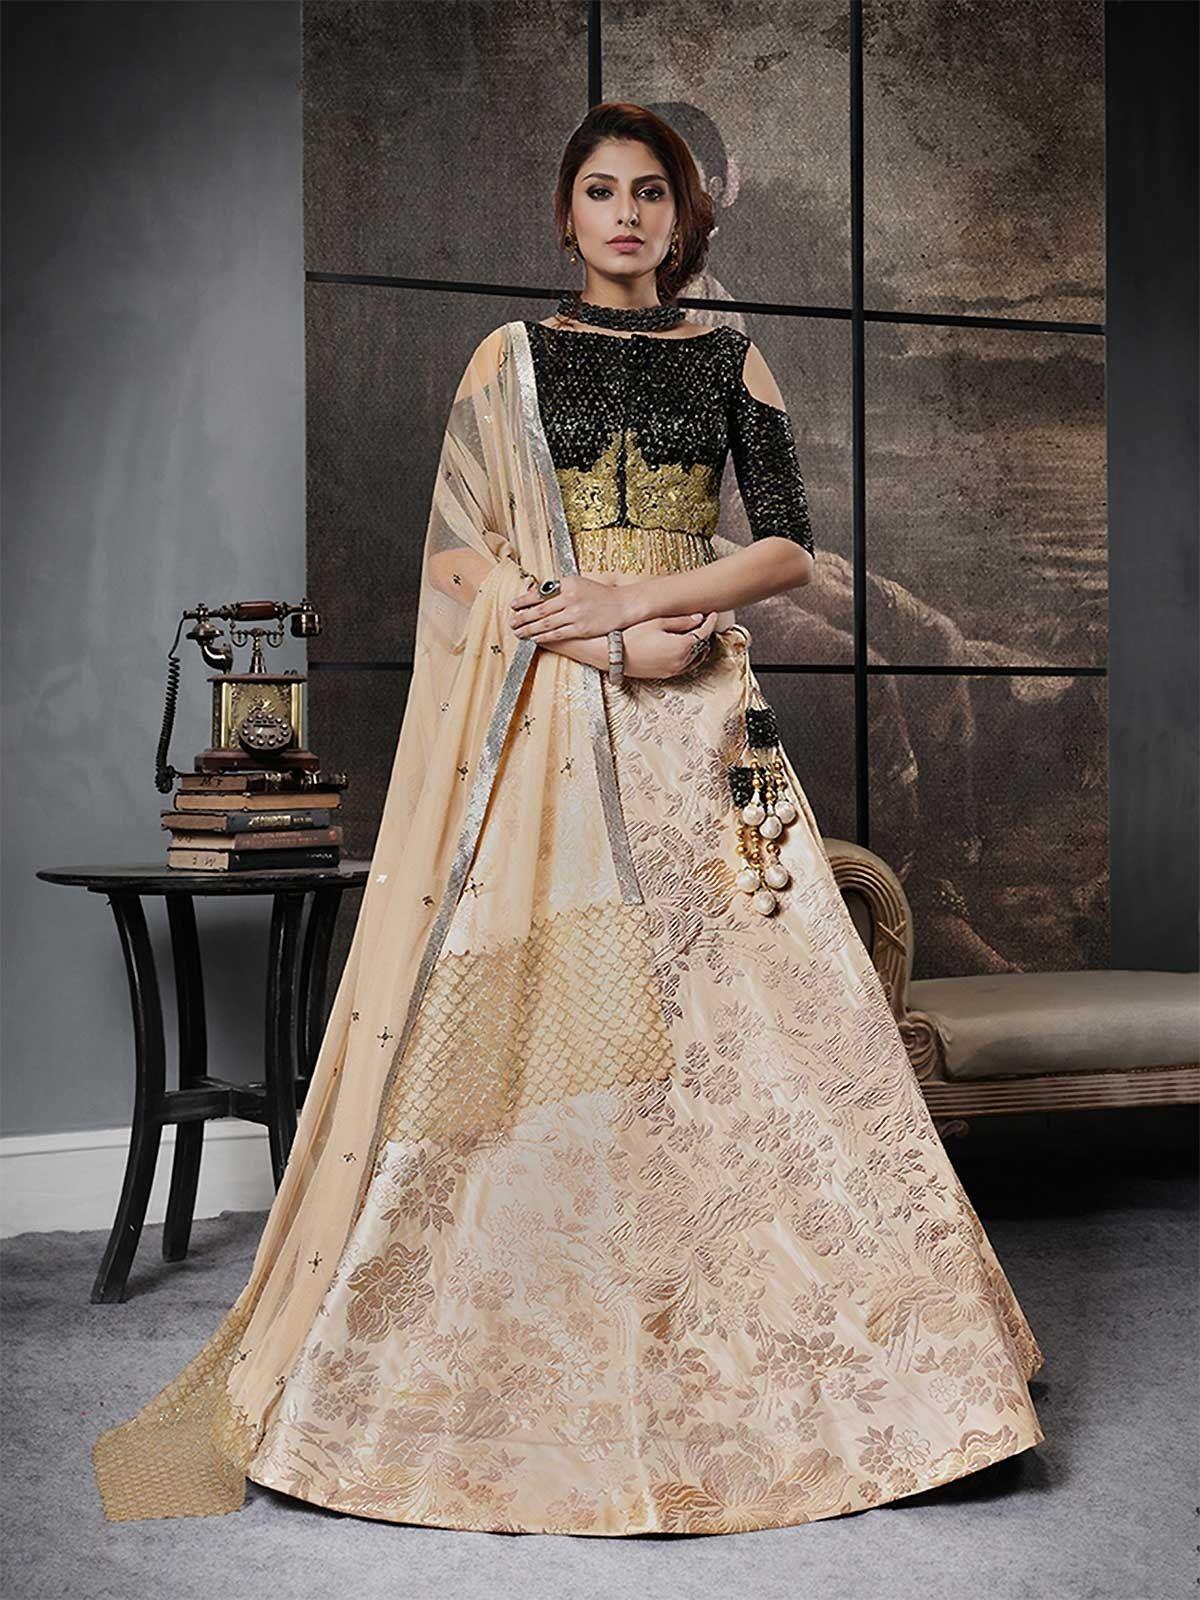 ec271123b5 Buy new beautiful beige lehenga choli online women ethnic wear from  ZaraaFab online shopping store UK. Shop wide range of adorable designer  lehenga choli ...